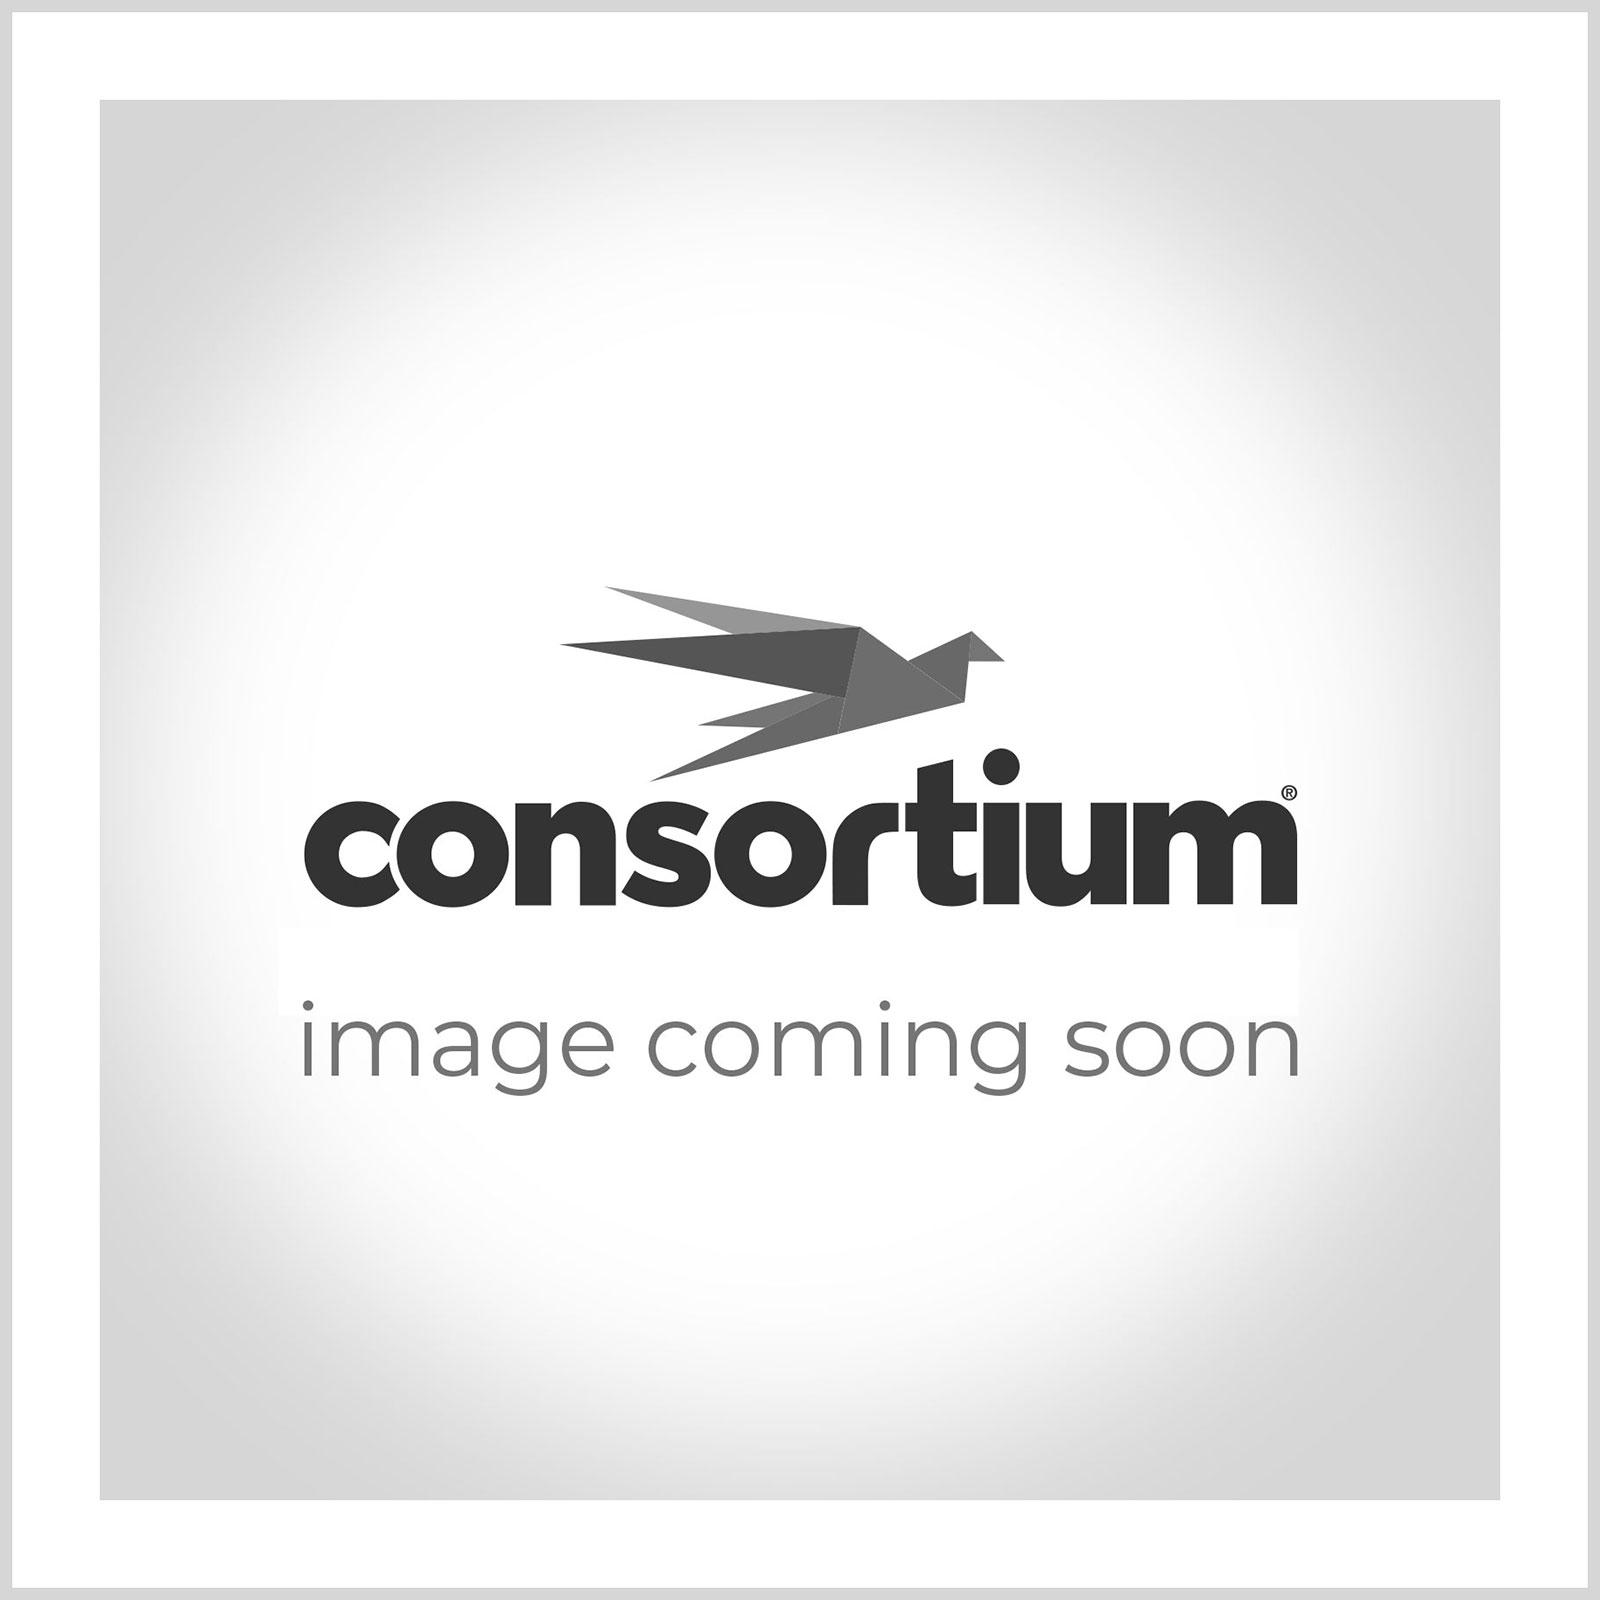 Consortium Stapler, Punch & Remover Set